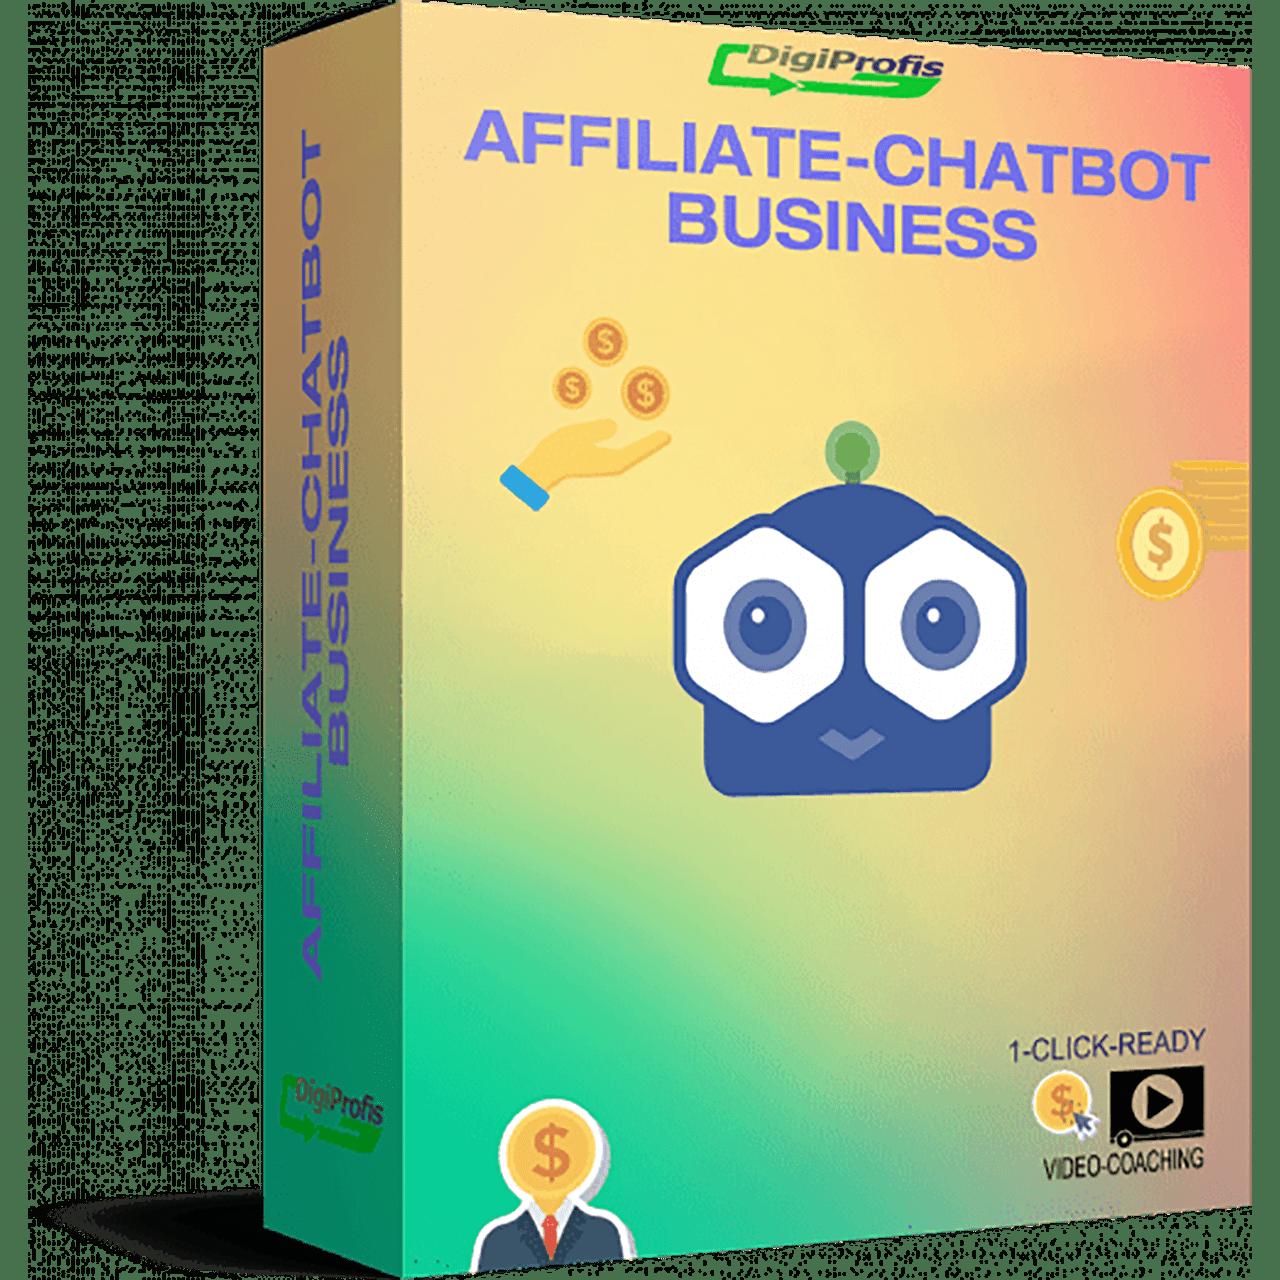 Affiliate-Chatbot-Business (Affiliate Marketing Kurs) von Daniel Rüter + 6 E-Books